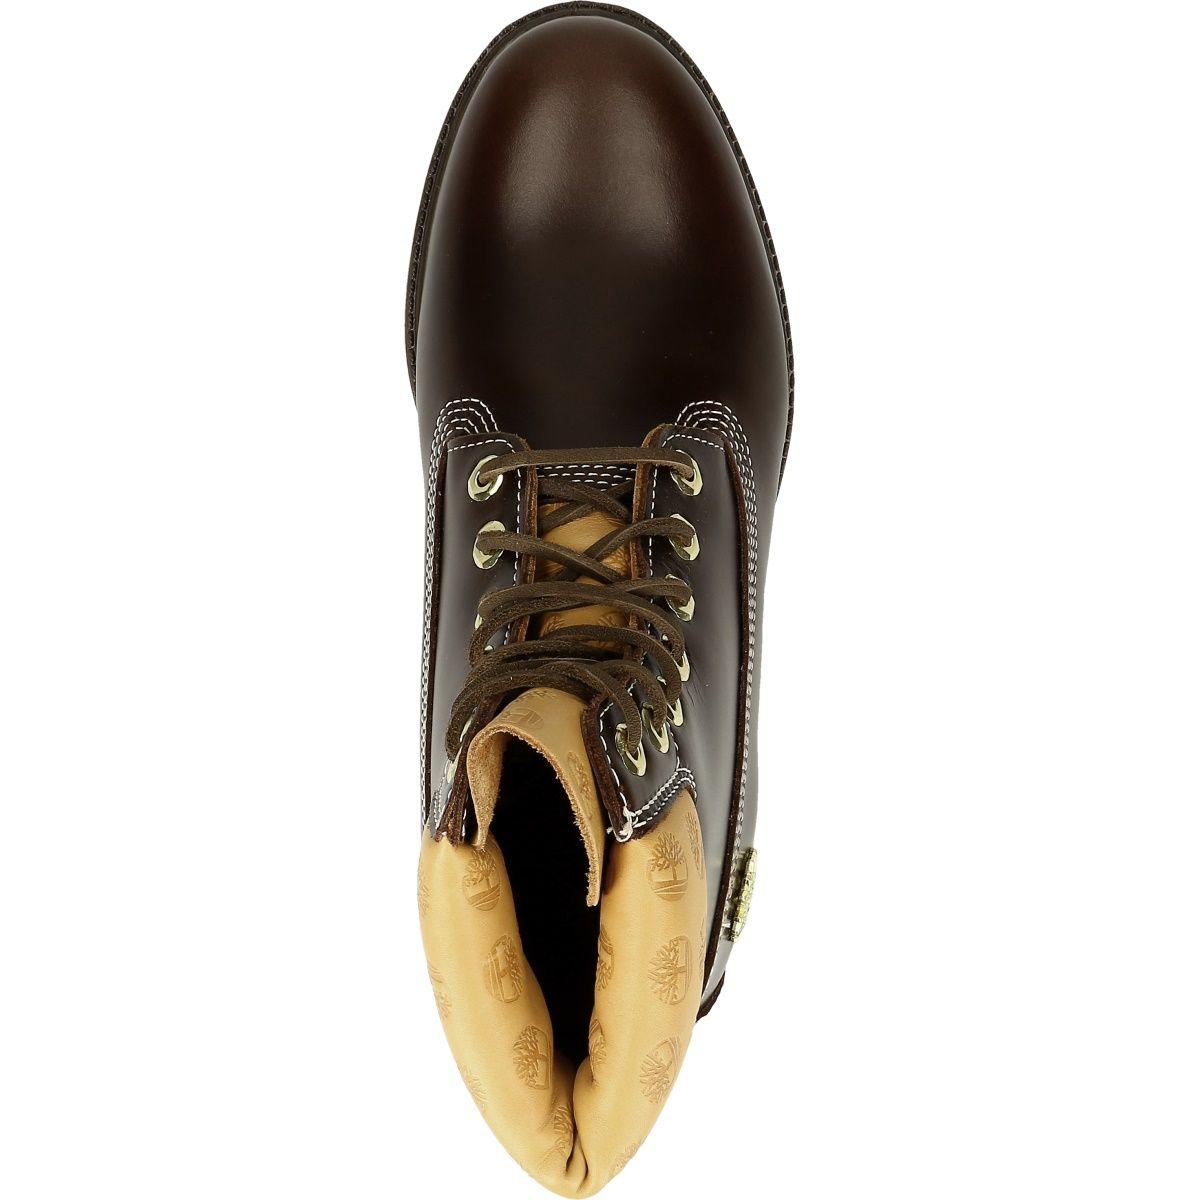 Timberland #A1QNA 6INCH PREMIUM BOOT Herrenschuhe Boots im